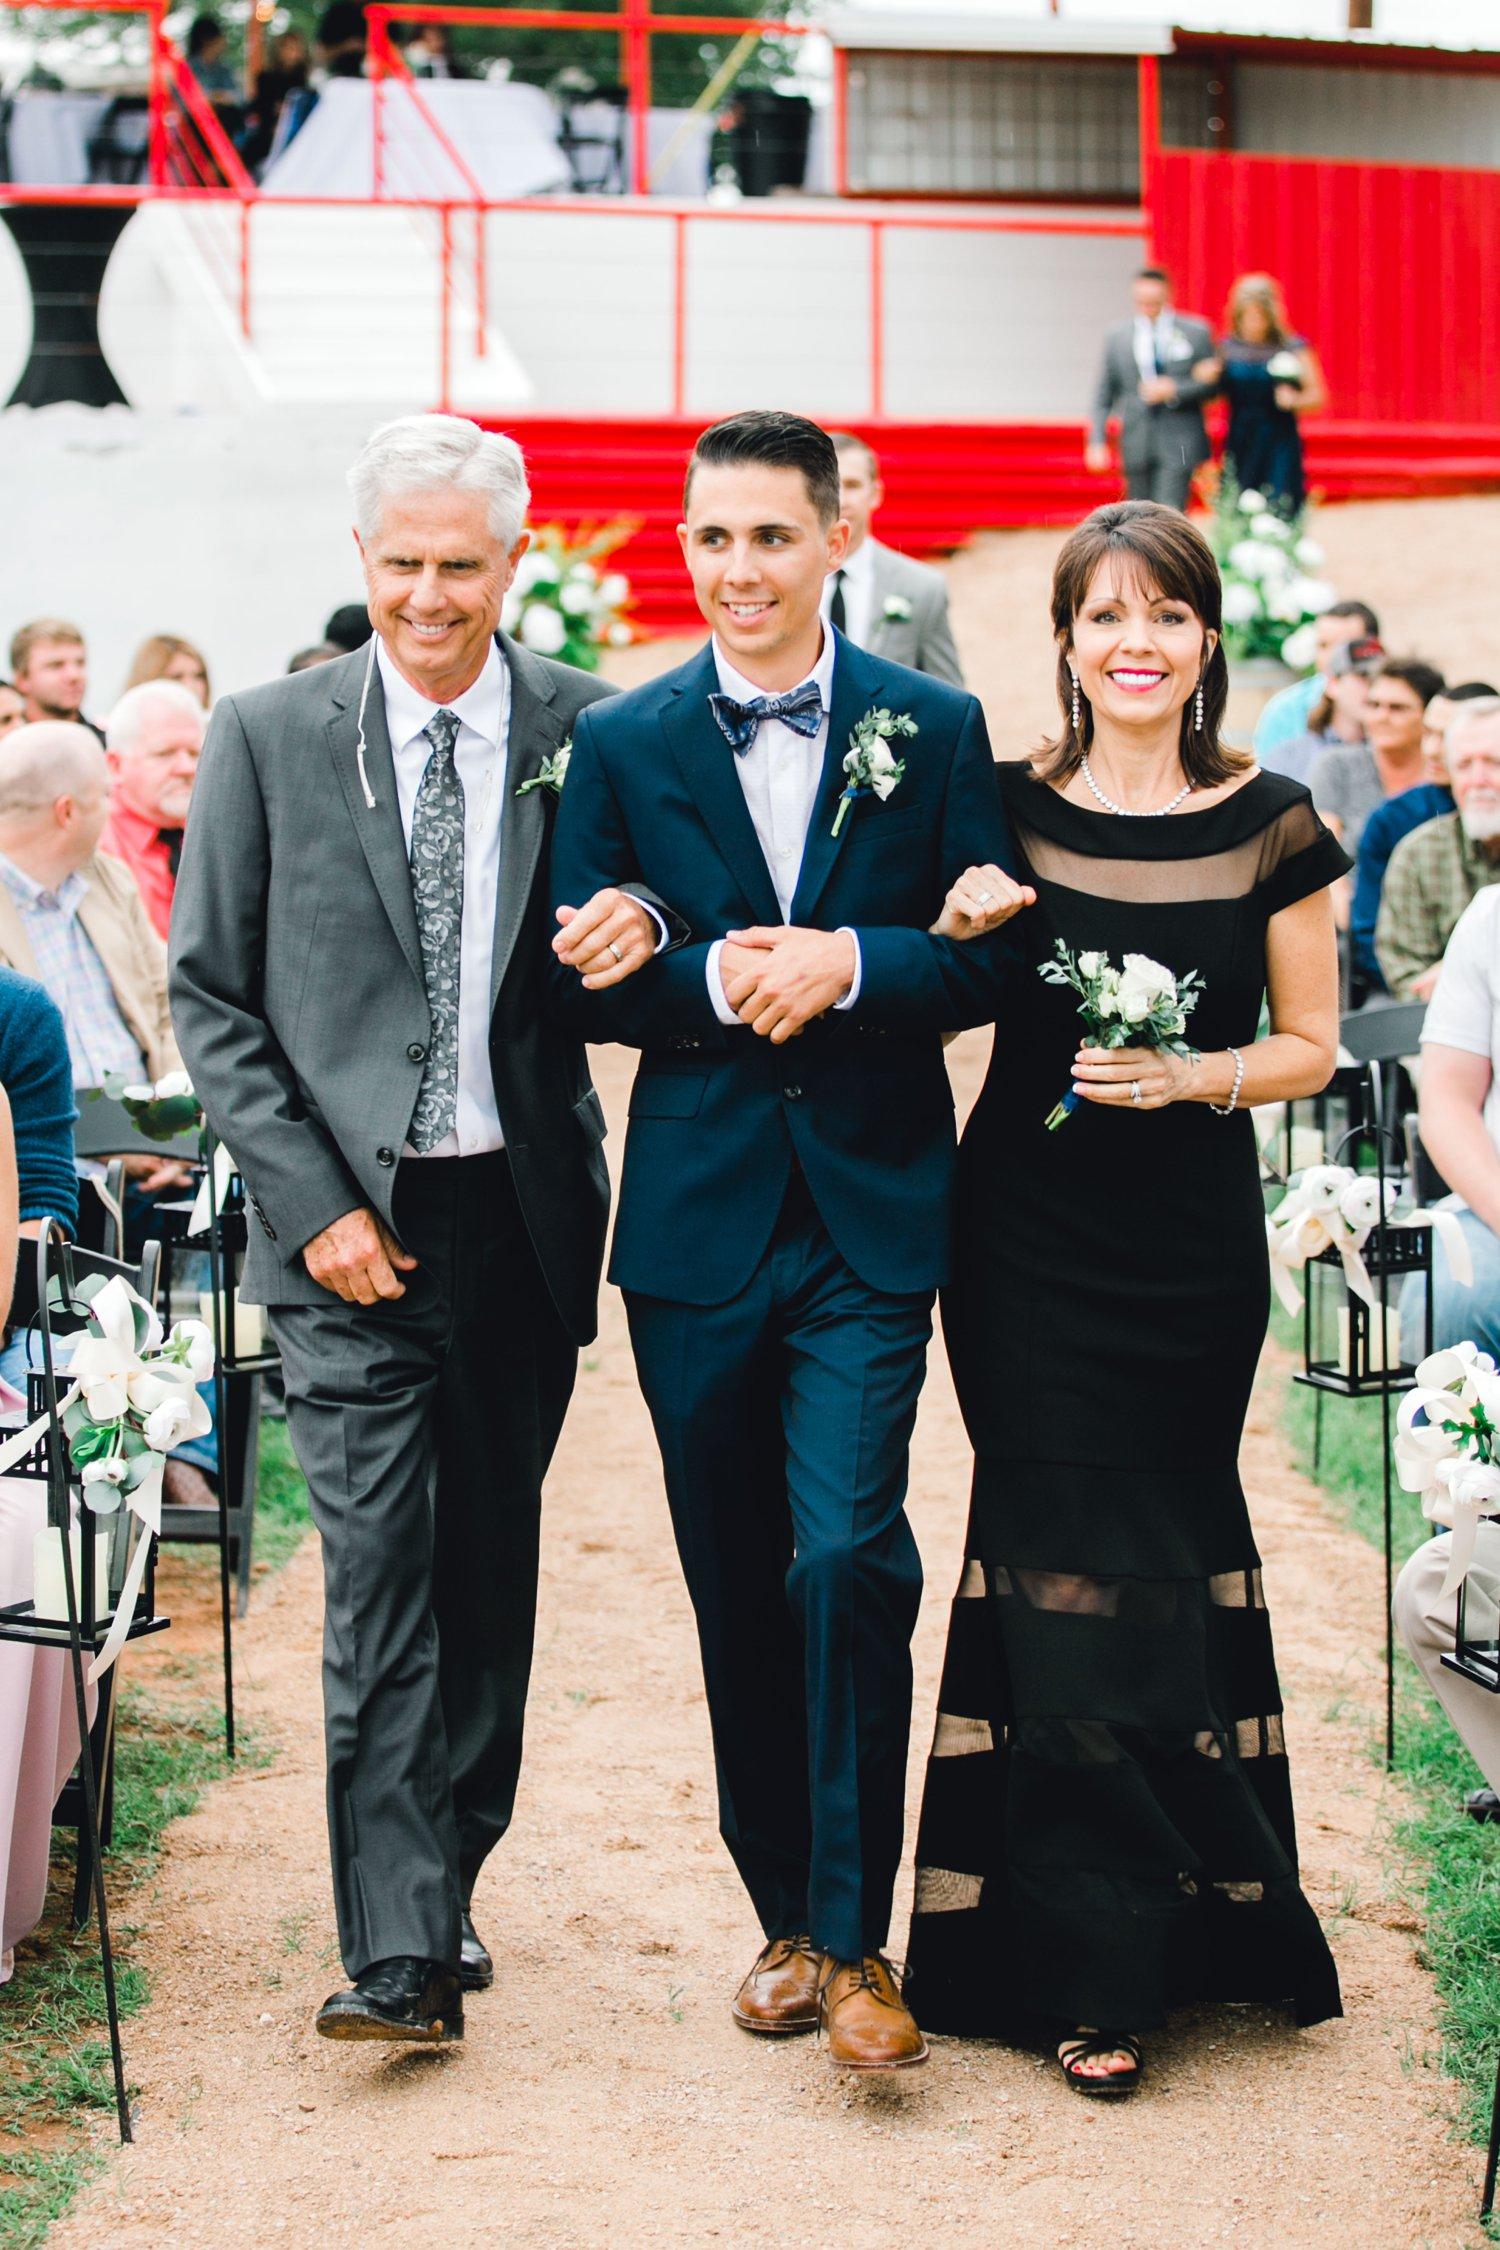 Ashley_John_English_Elegant_Texas_Wedding_Outdoors_Ranch_Caprock_Winery_ALLEEJ_0098.jpg